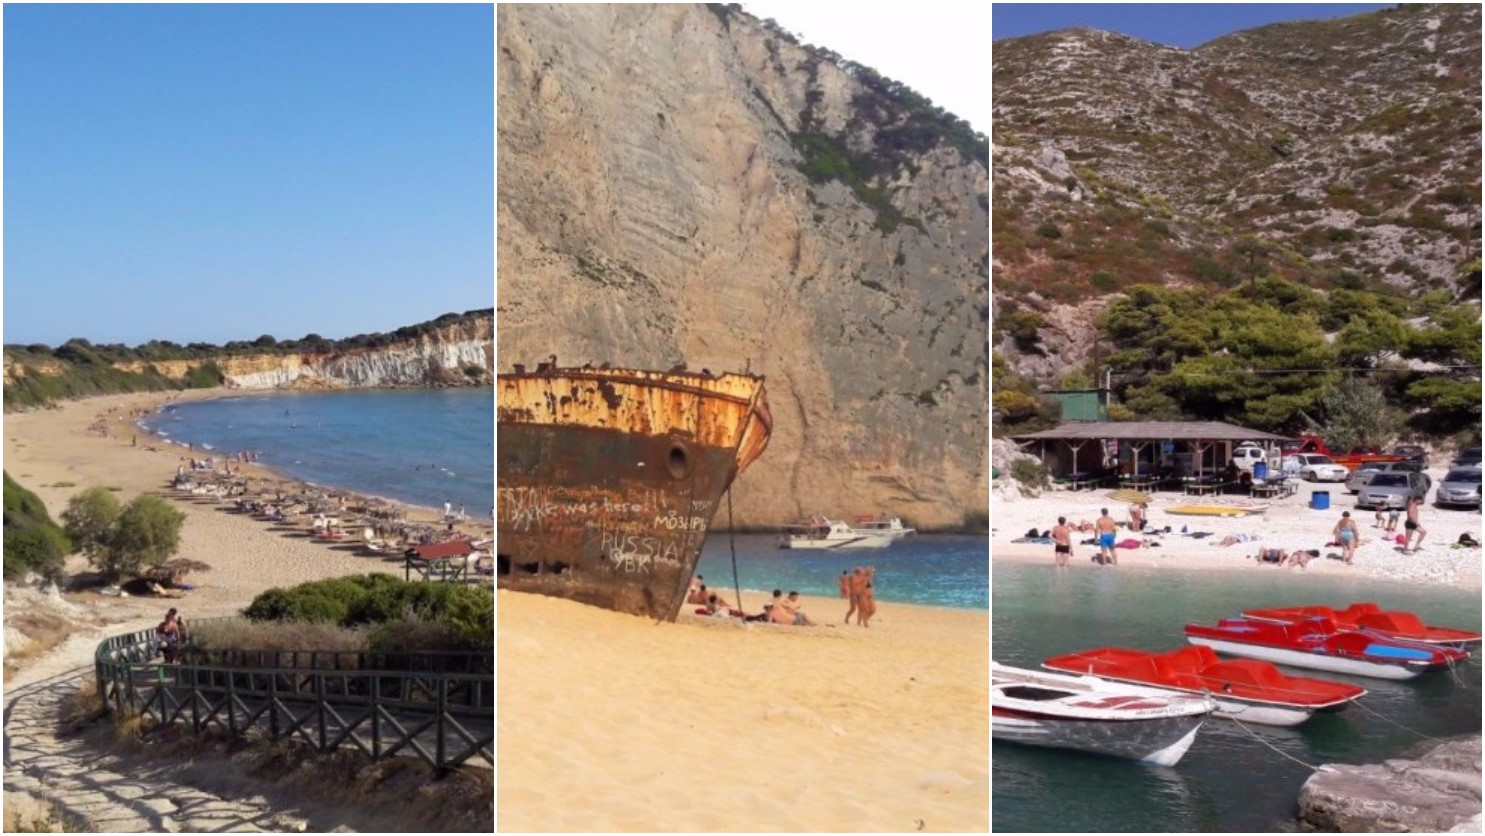 Explore Zante beaches - Gerakas Beach | Navagio Beach | Porto Vromi Beach